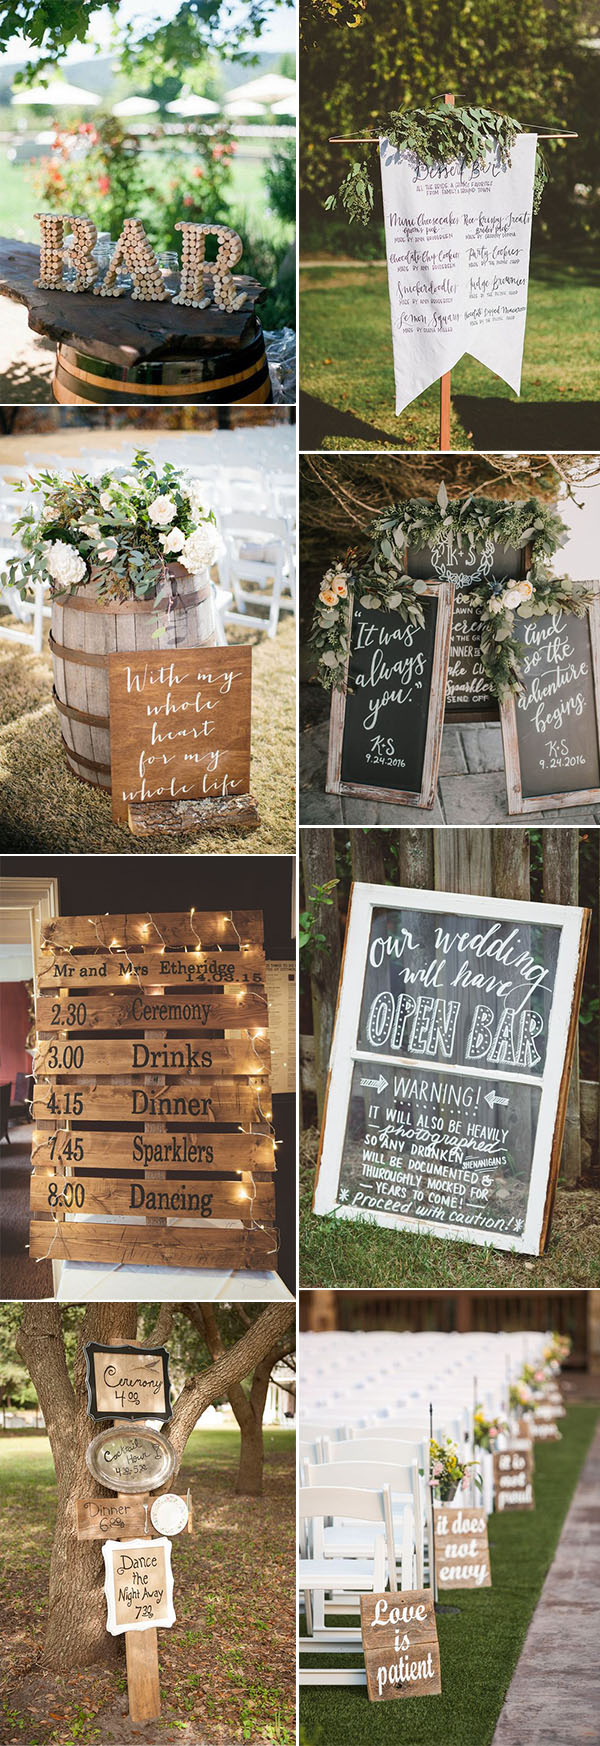 Rustic Wedding Decor Diy Top 10 Diy Projects For Rustic Wedding Ideas Elegantweddinginvites